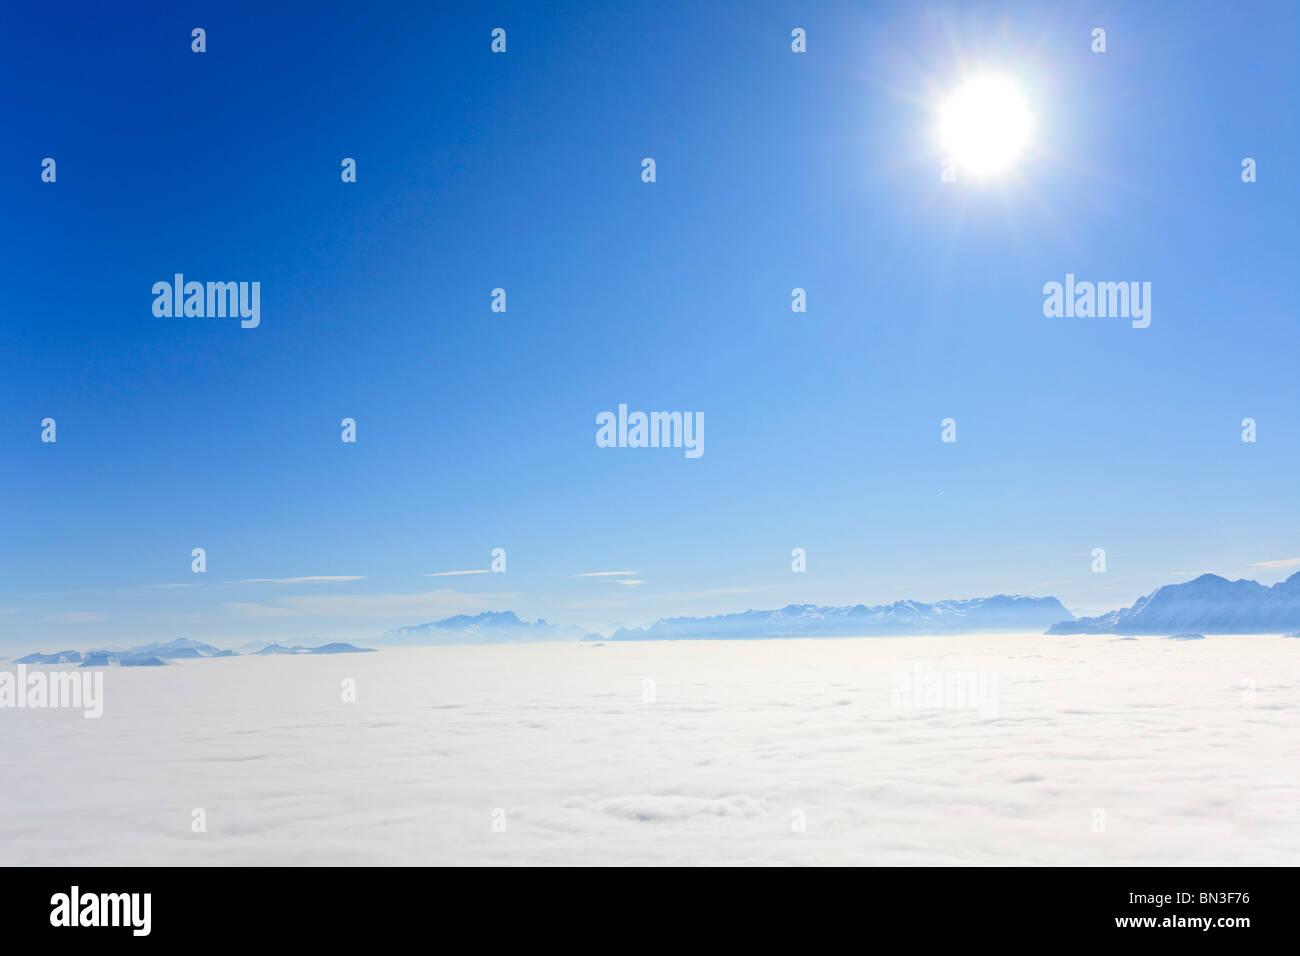 Fog covering the Salzachtal, Salzburger Land, Austria - Stock Image